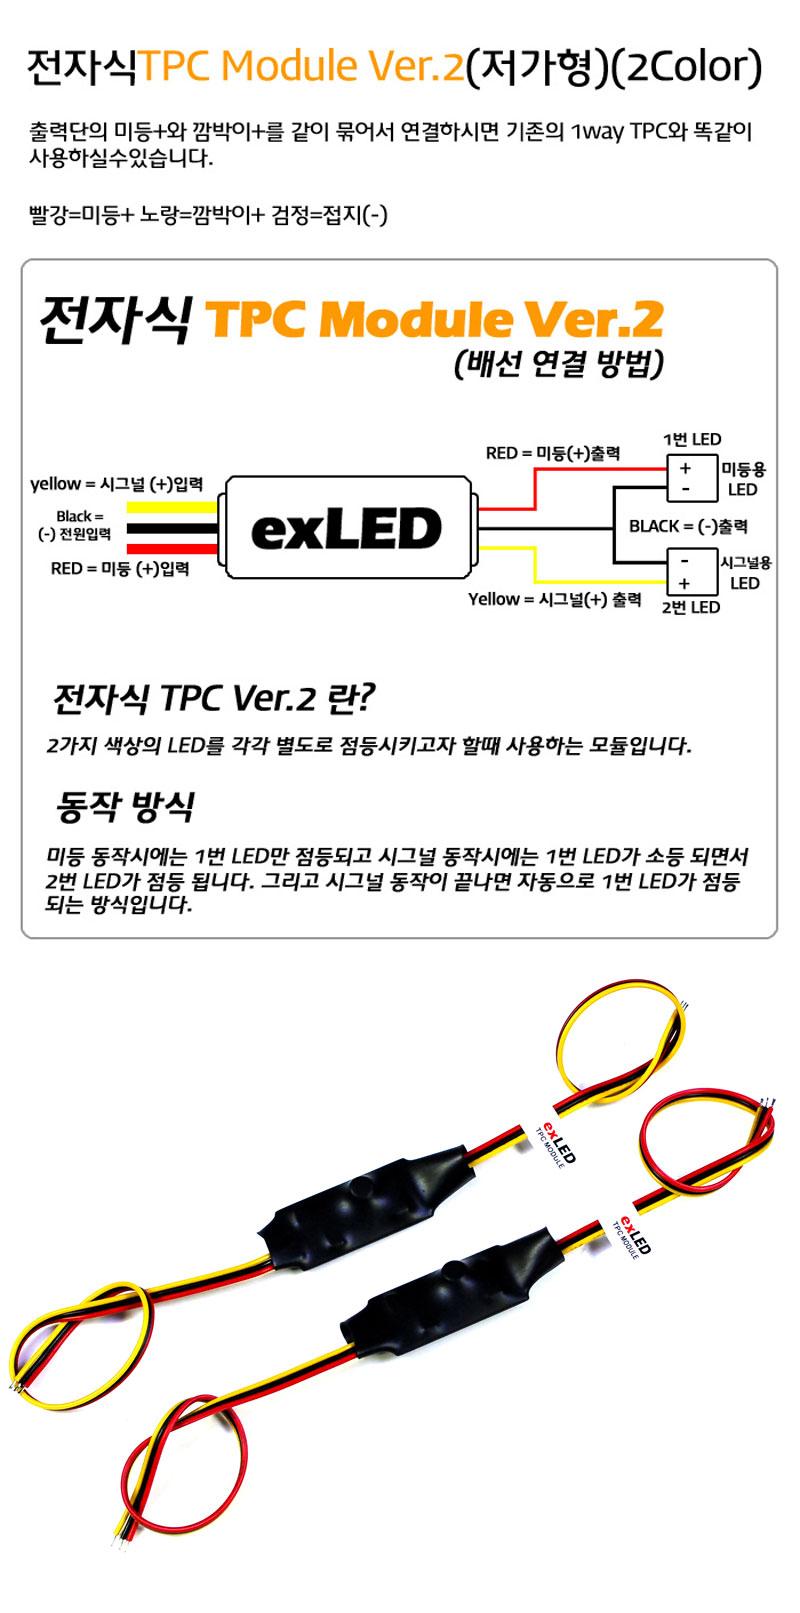 exLED 전자식TPC 모듈 Ver.2 [저가형] (2Color용::좌우2개 1셋트)